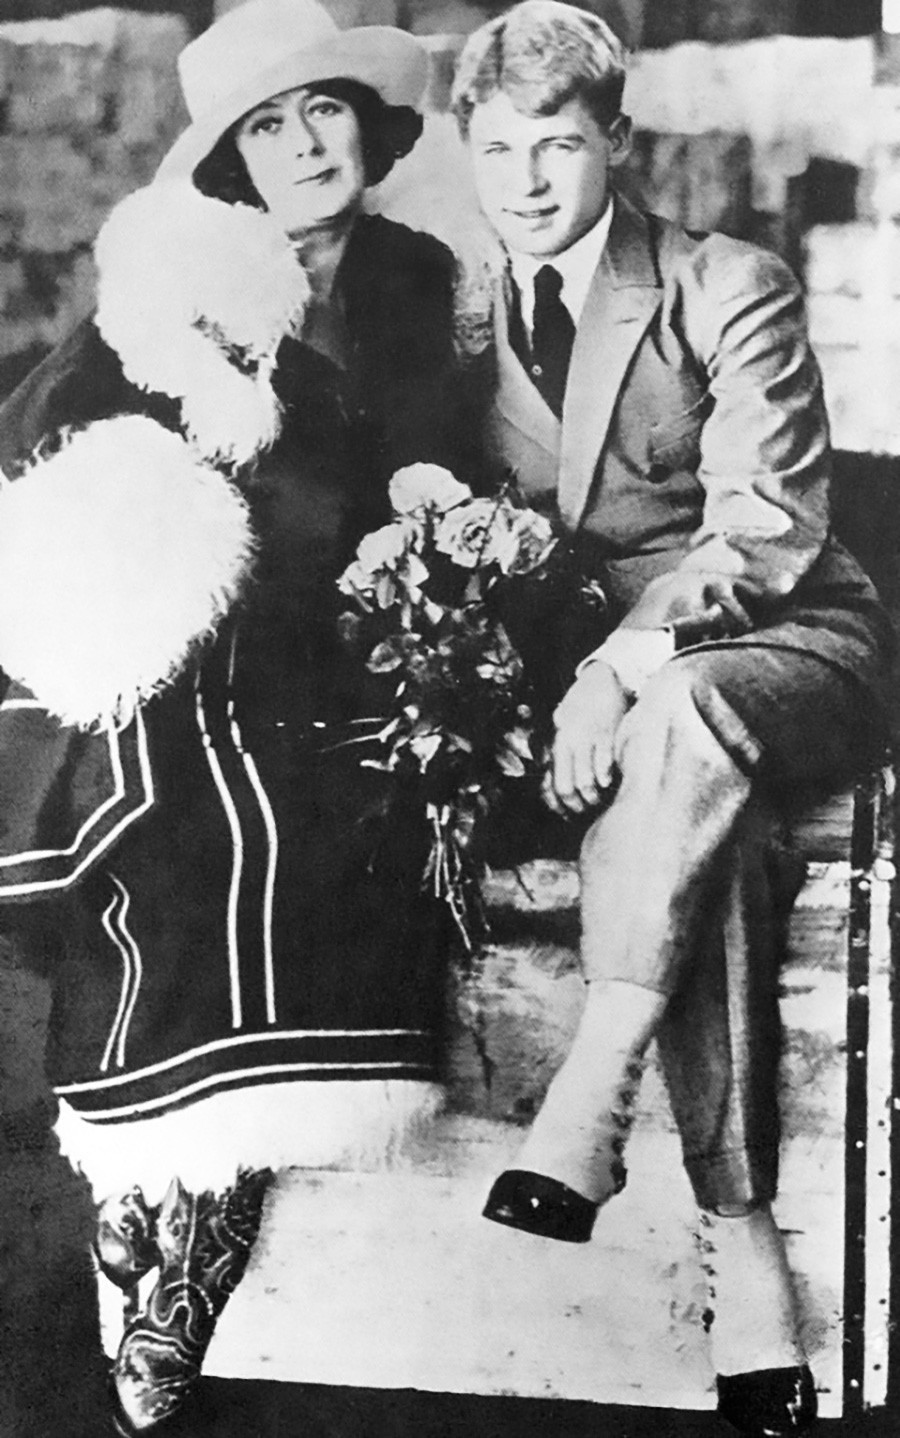 Sergei Yesenin and Isadora Dunkan in the U.S.